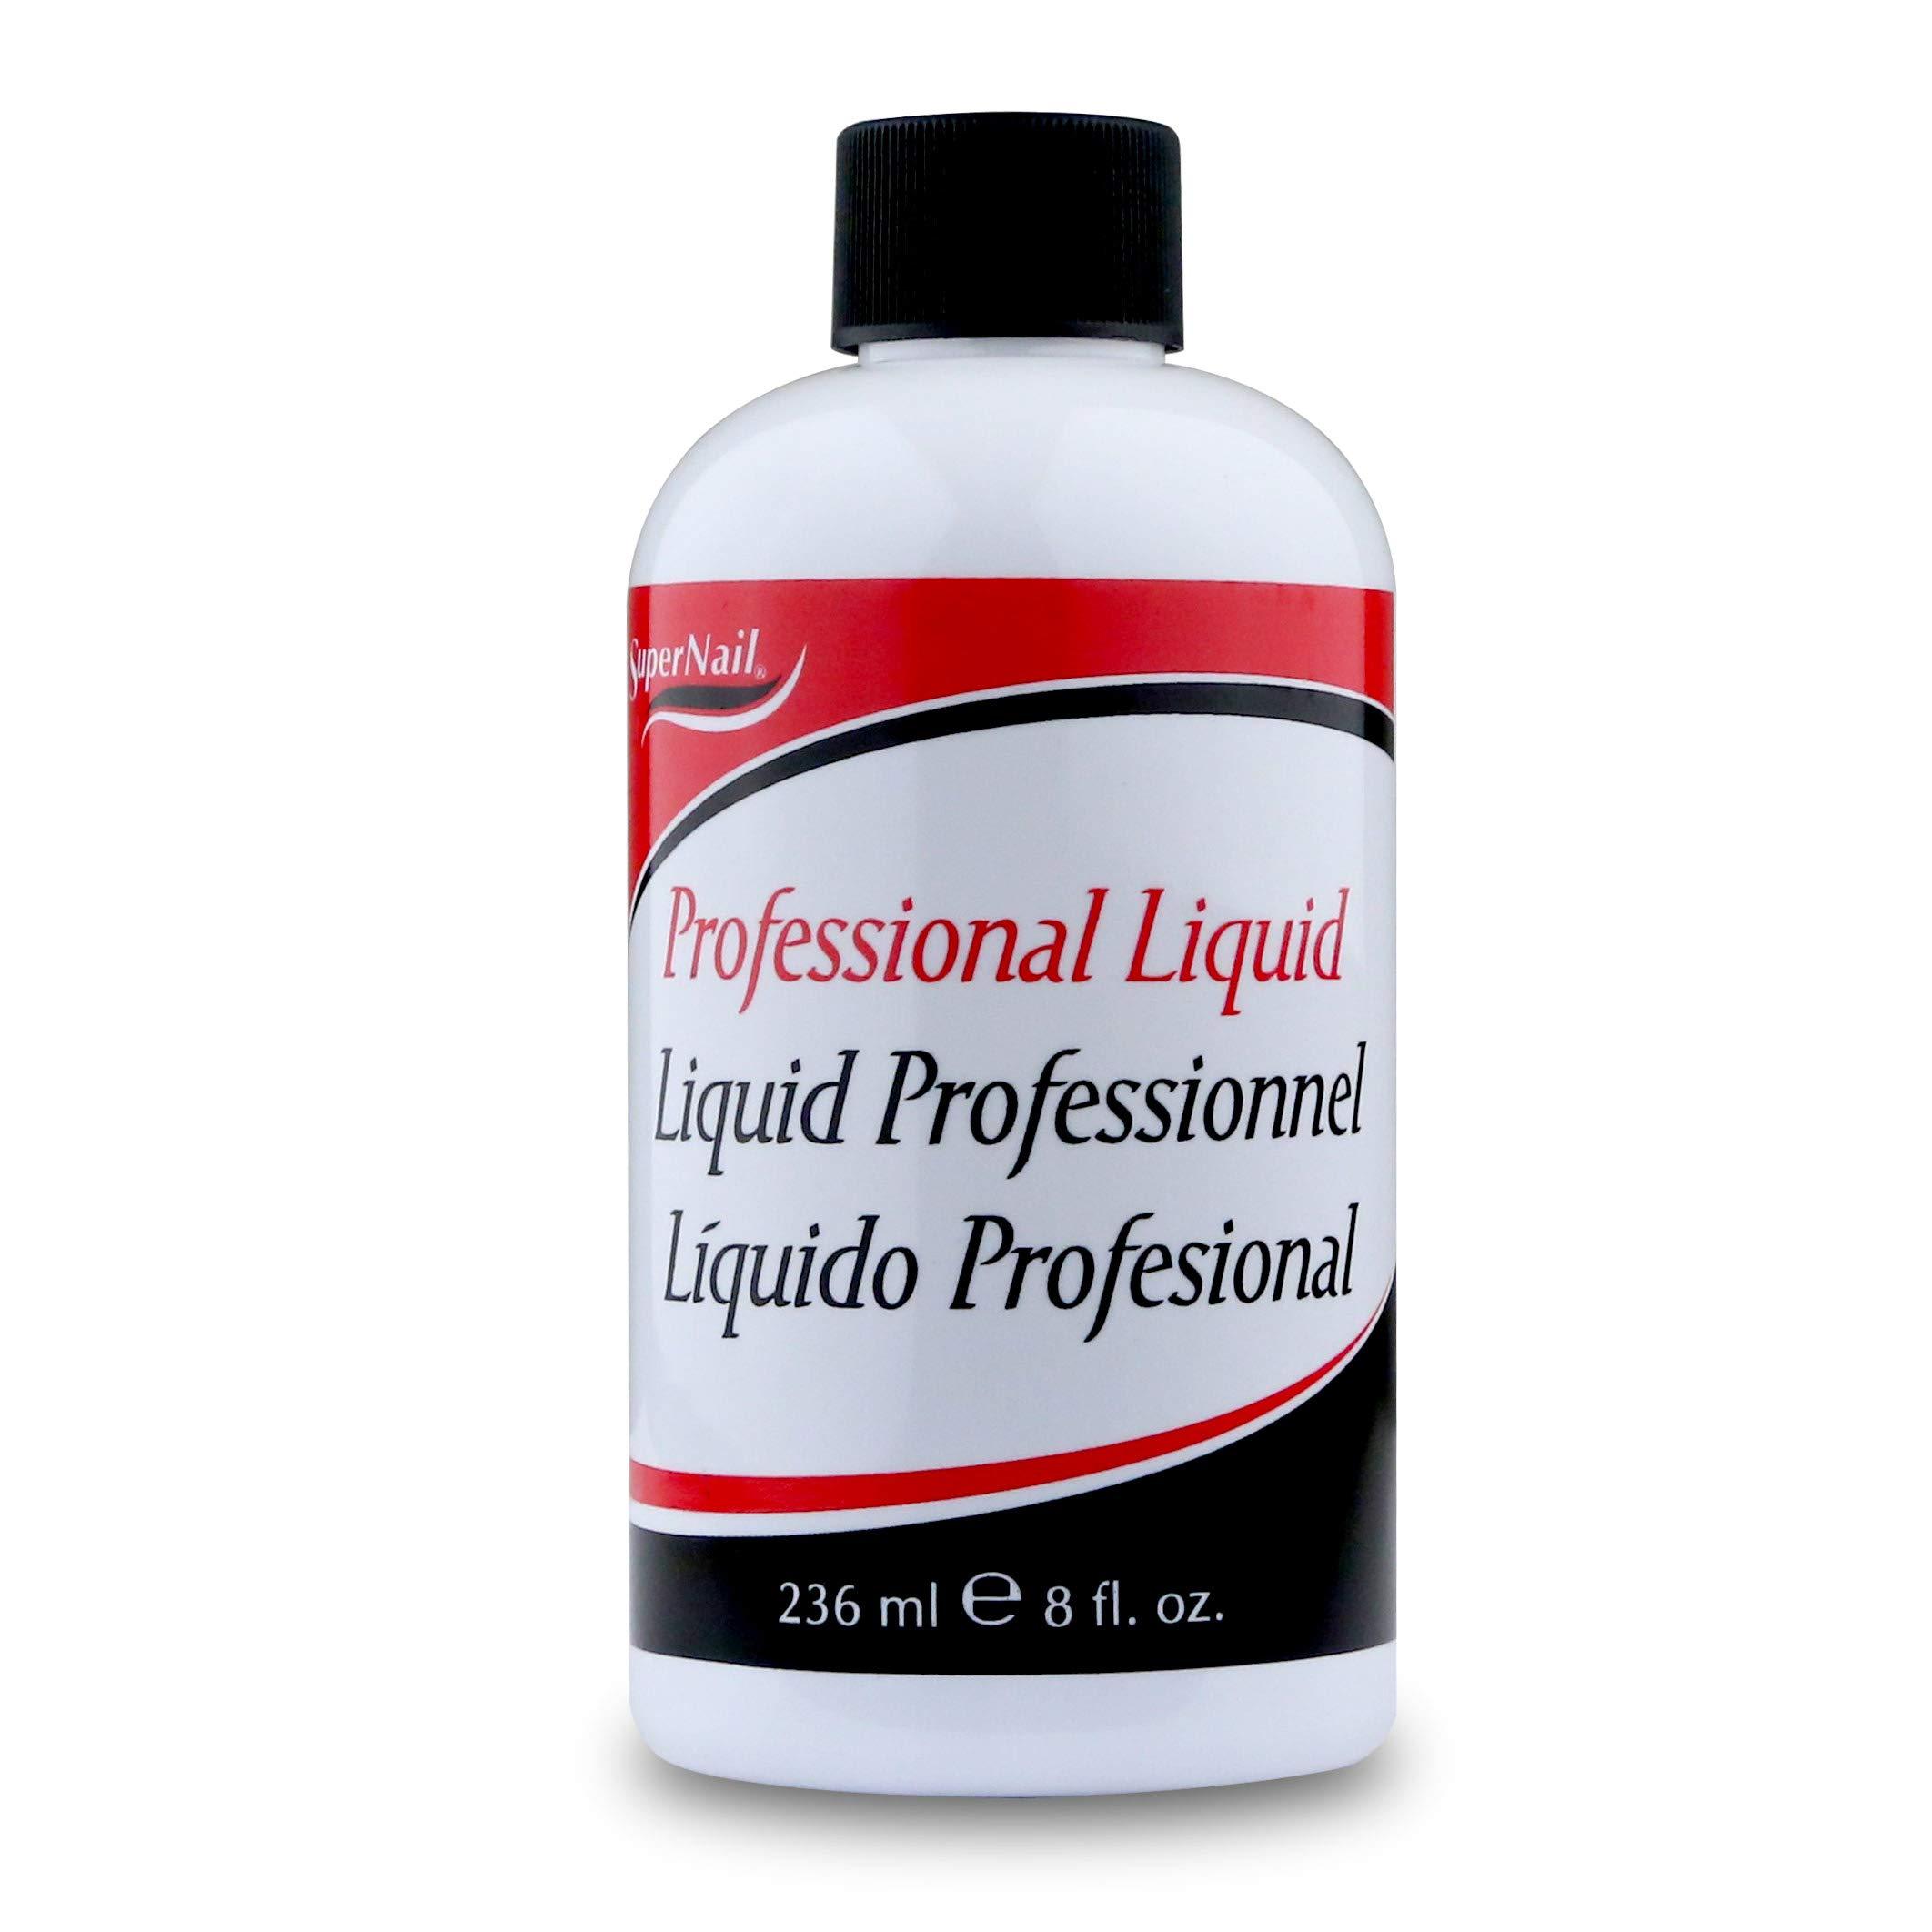 Acrylic Powders & Liquids Health & Beauty Pink 2oz #51405 With A Long Standing Reputation Supernail Professional Acrylic Powder